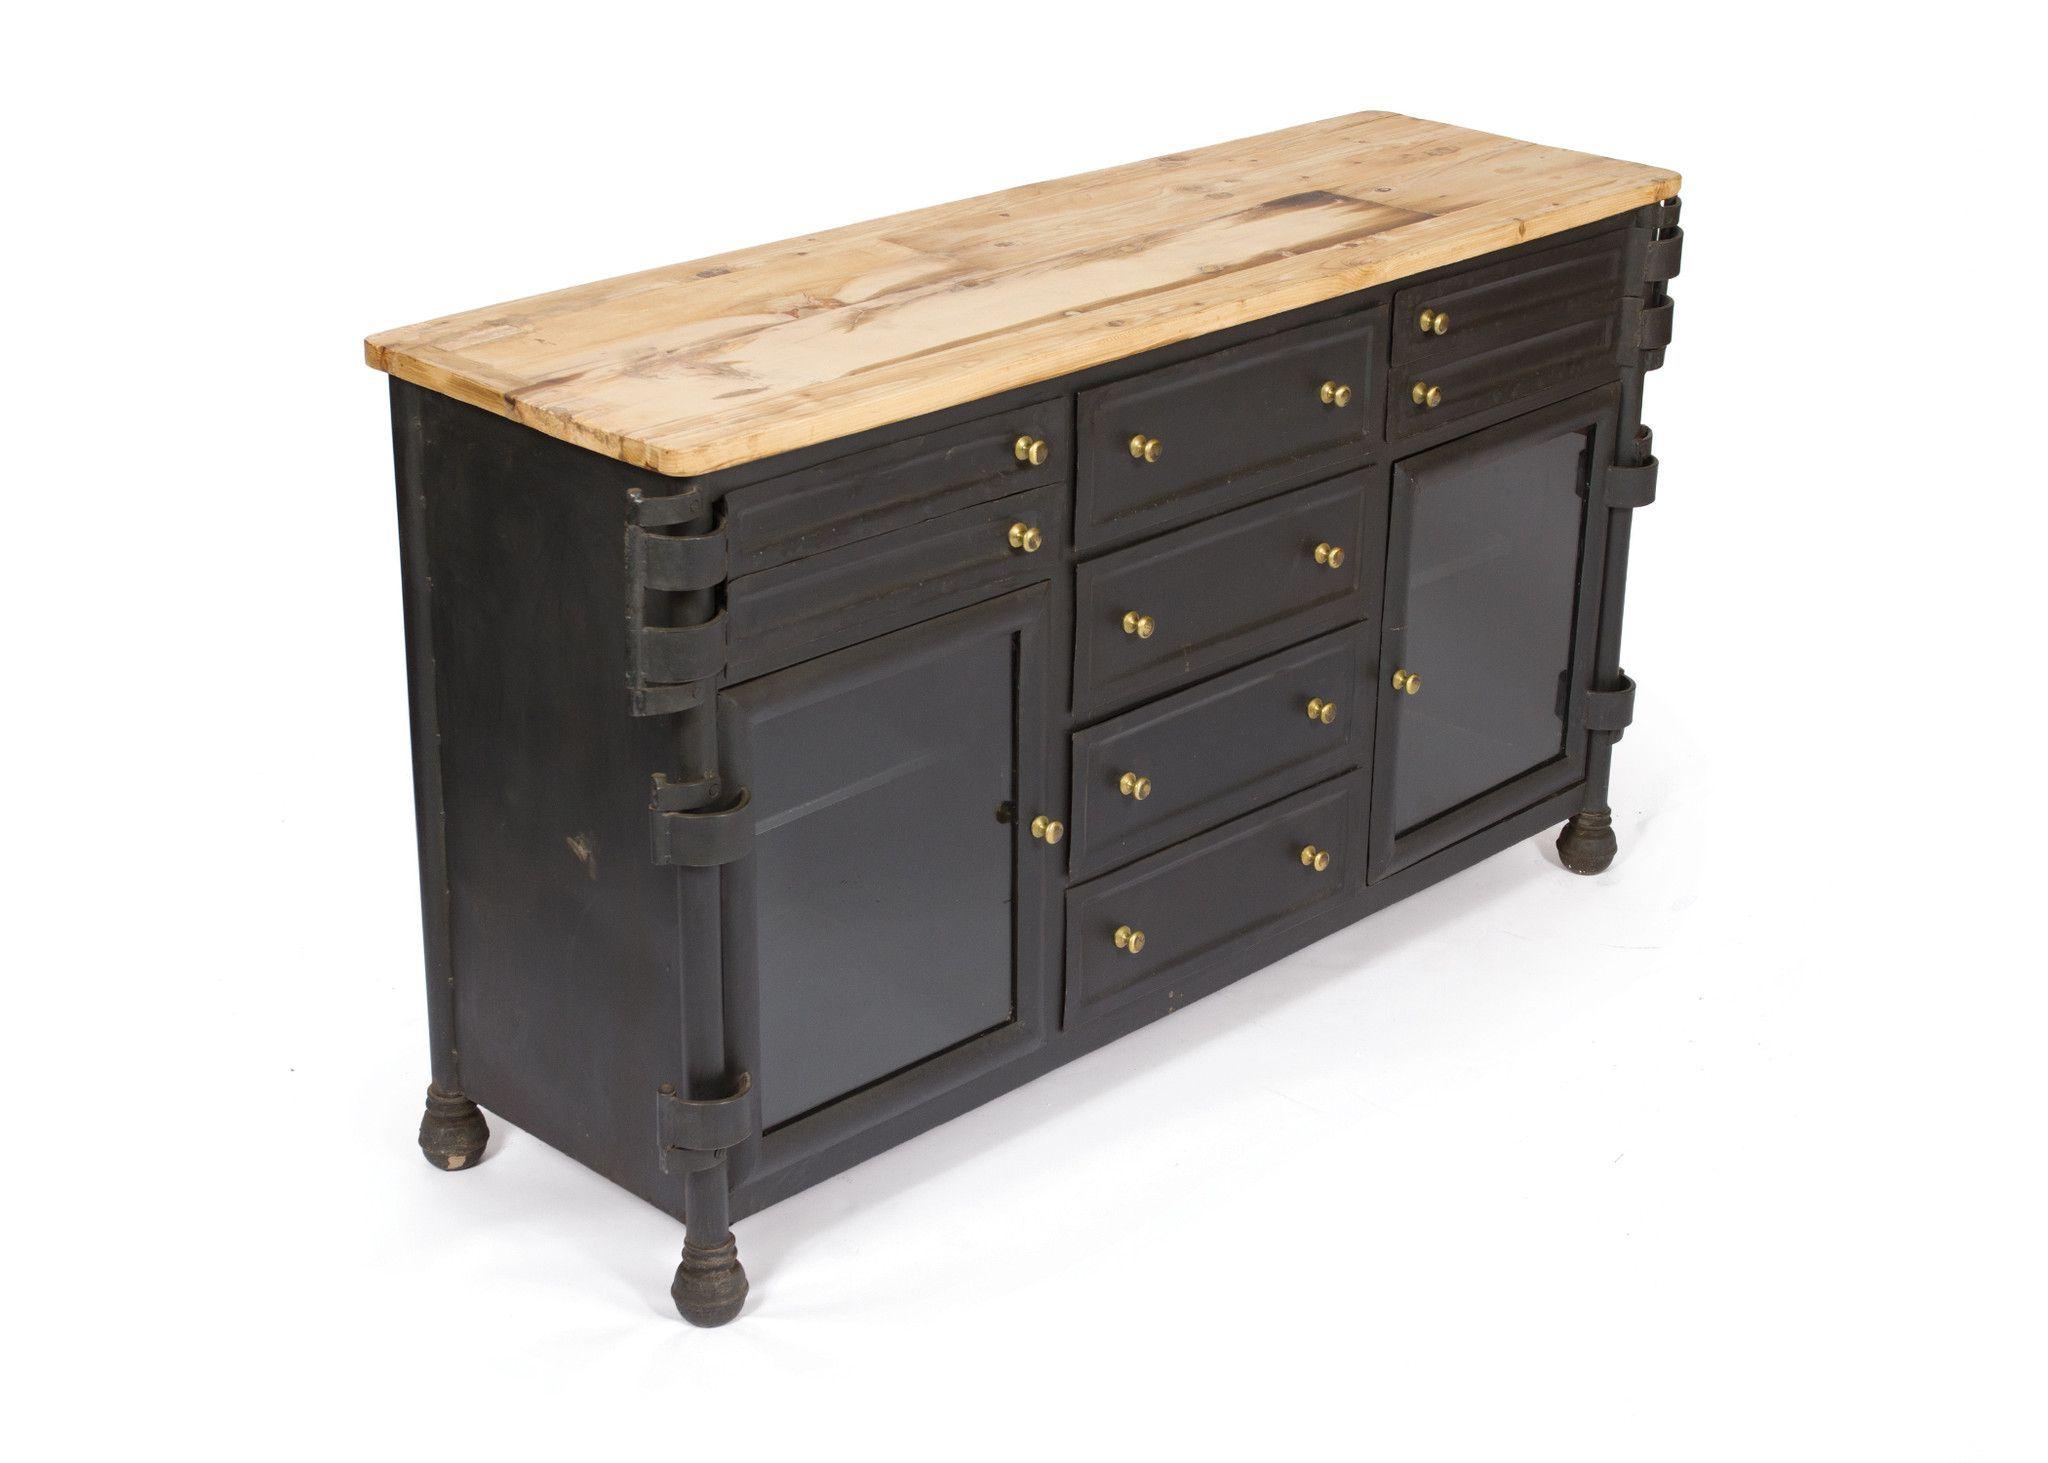 Dental Cabinet with Reclaimed Wood on Vintage Steel